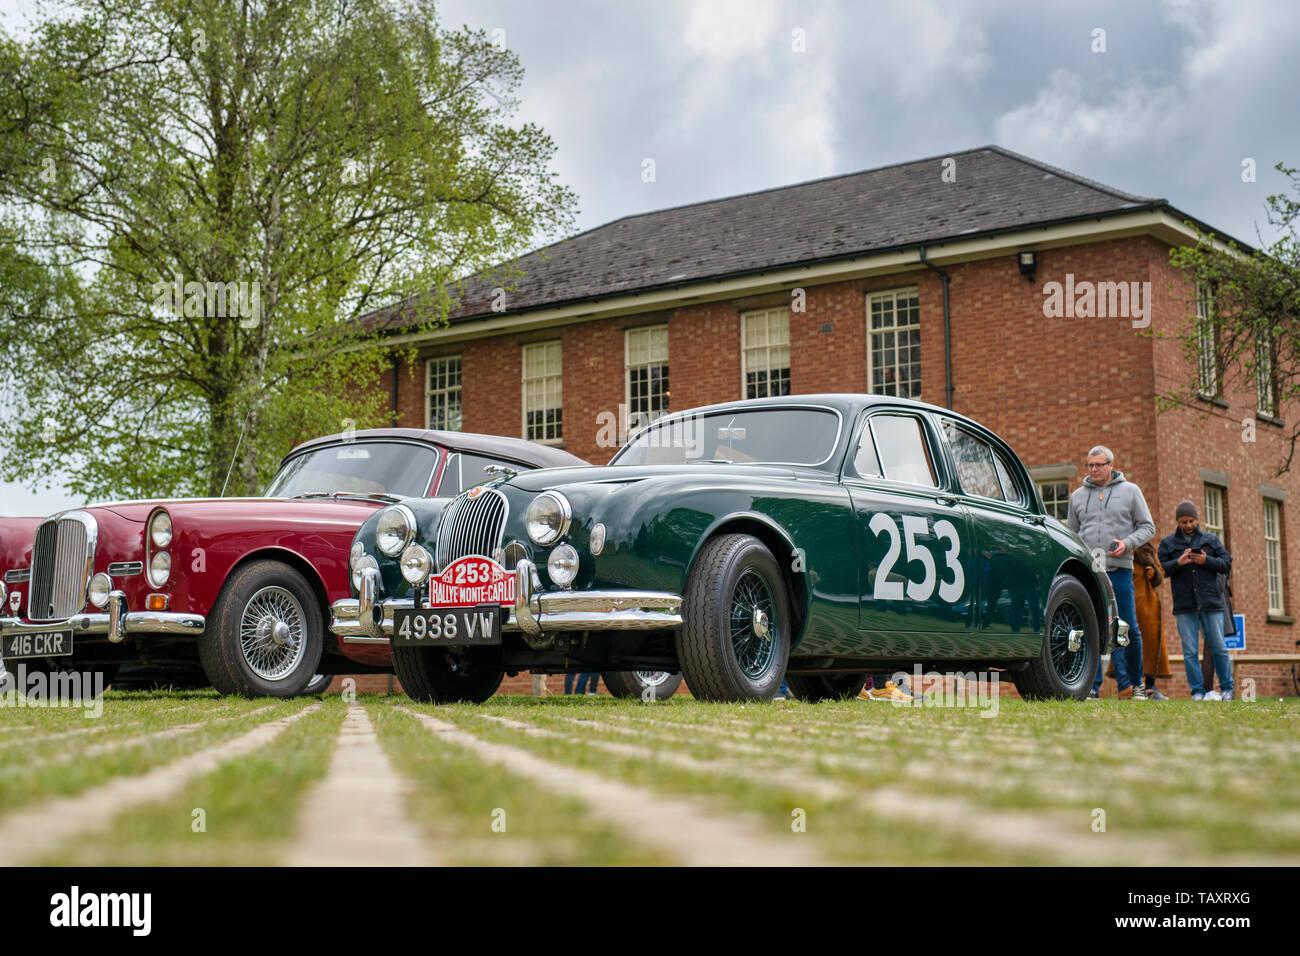 1957 Jaguar 3.4 340 car at Bicester Heritage centre 'Drive it day'. Bicester, Oxfordshire, England. Vintage filter applied - Stock Image